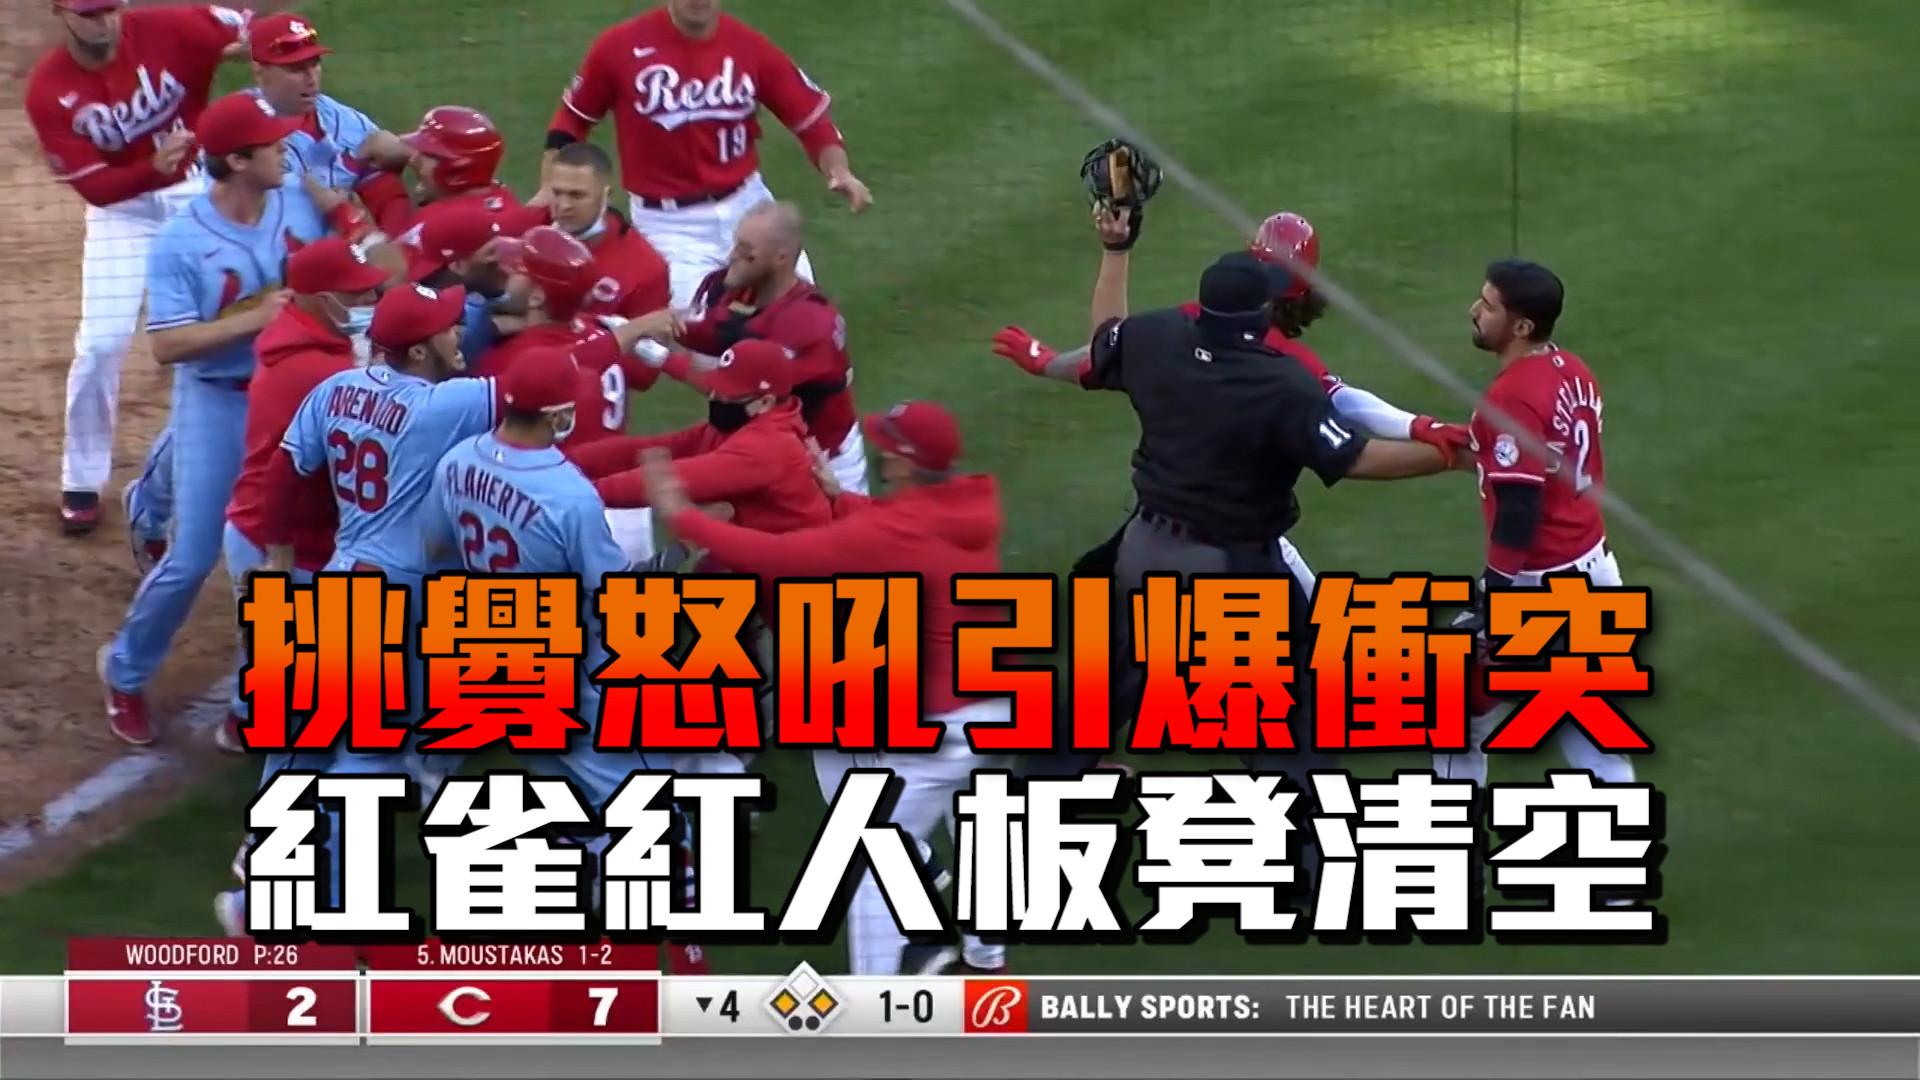 【MLB看愛爾達】挑釁怒吼引爆衝突 紅雀紅人板凳清空 4/4